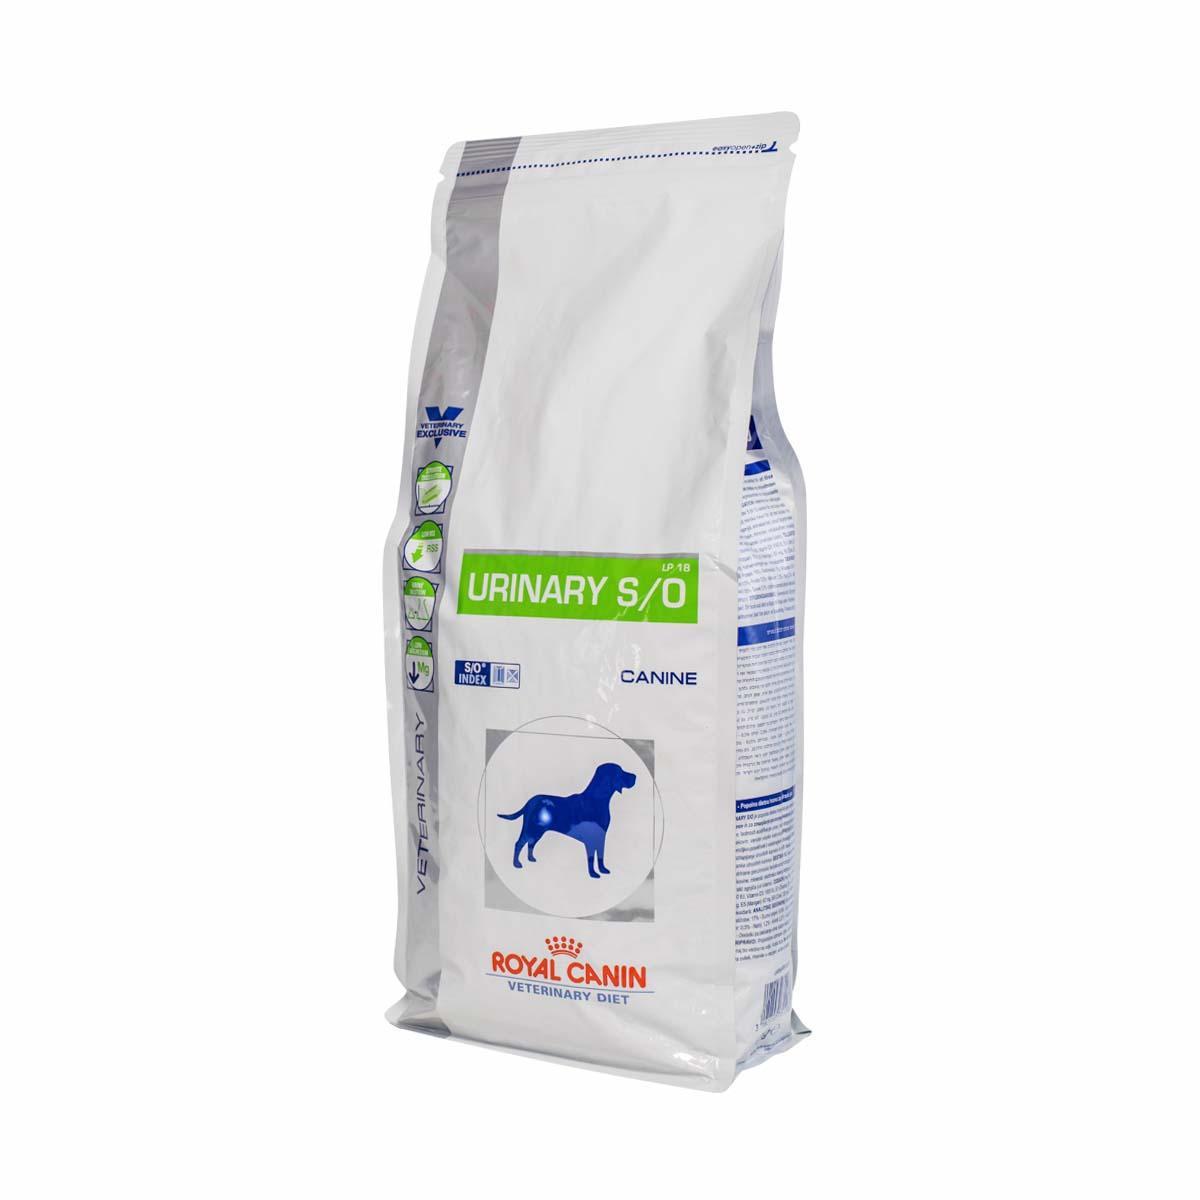 Royal Canin Vet Diet Dog Food Urinary S O